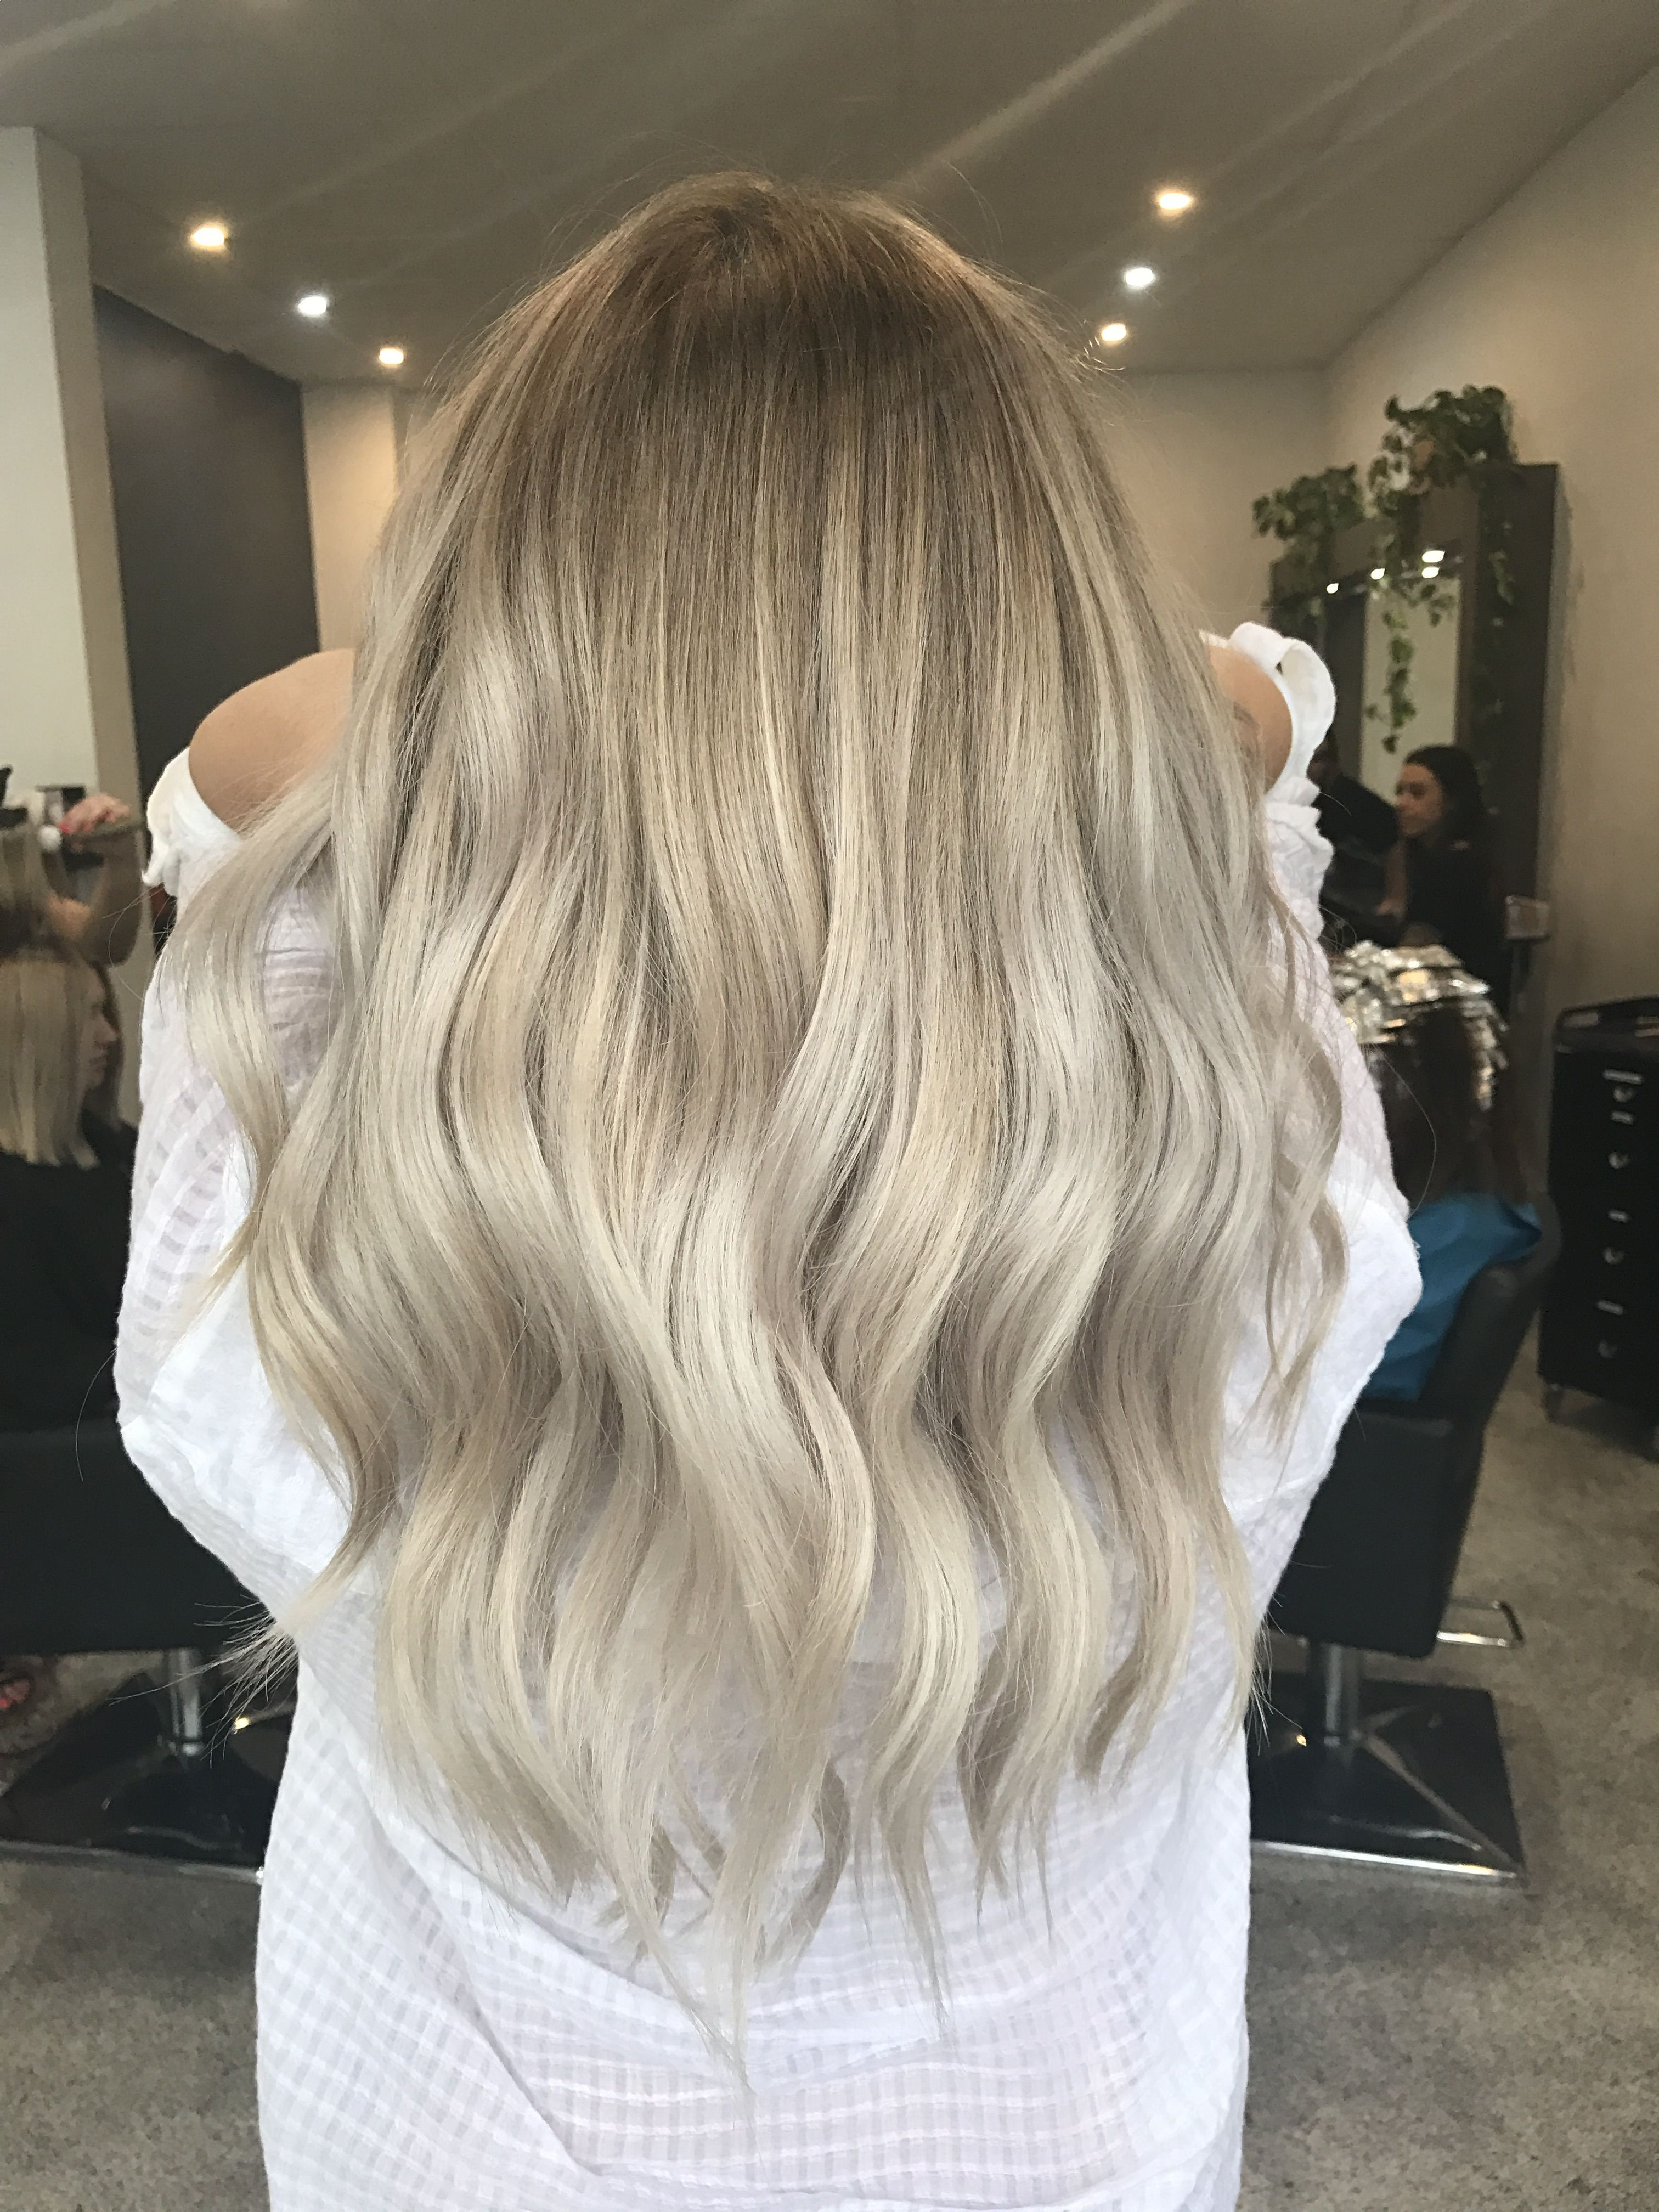 Cool Ash Blonde Balayage Long Hair Curls With Images Ash